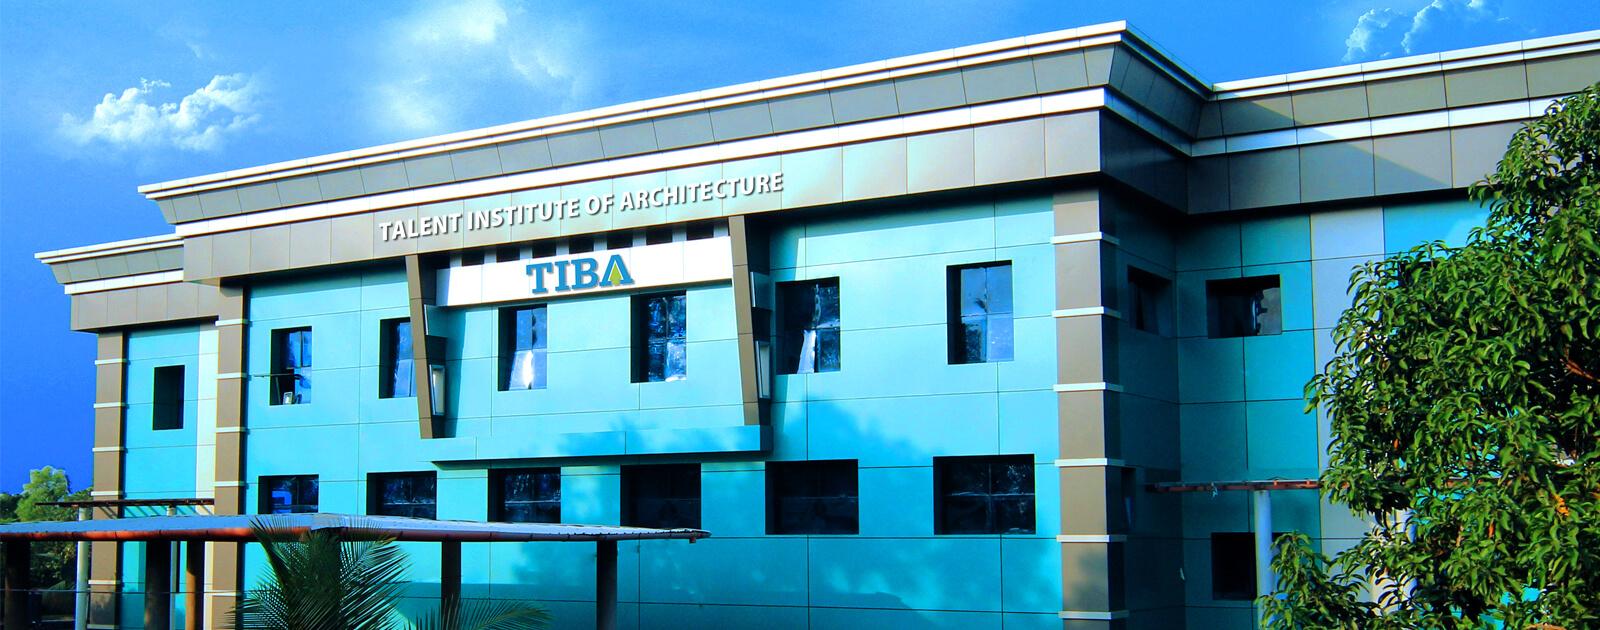 TIBA (Talent Institute of Architecture), Malappuram